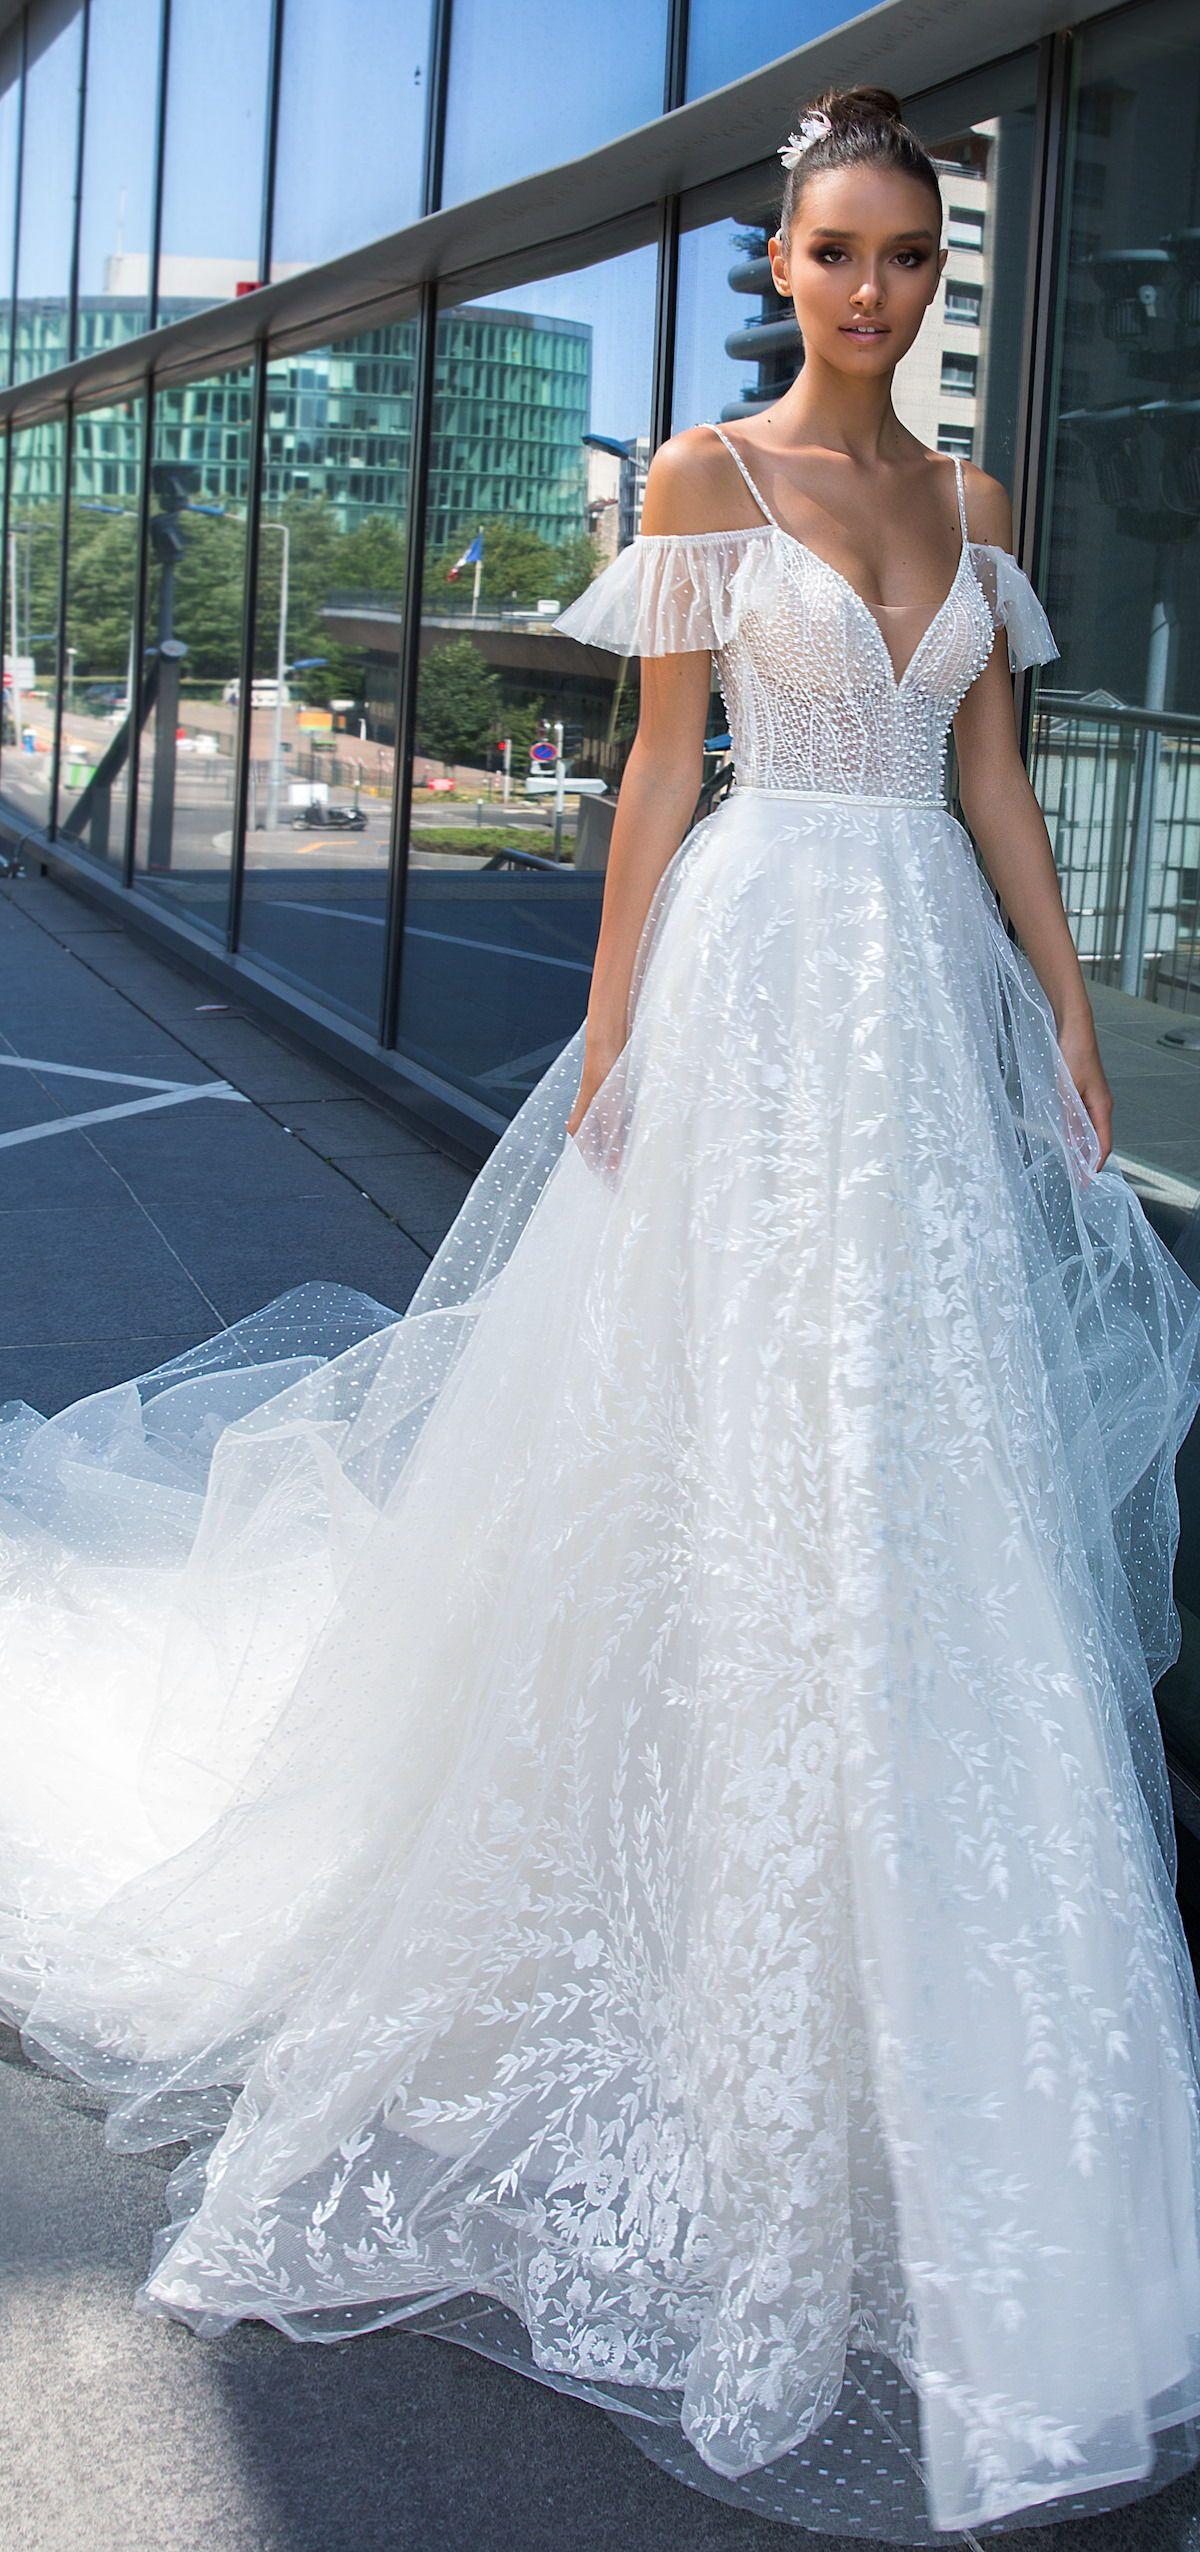 Wedding Dress by Crystal Design Sunny Paris Bridal